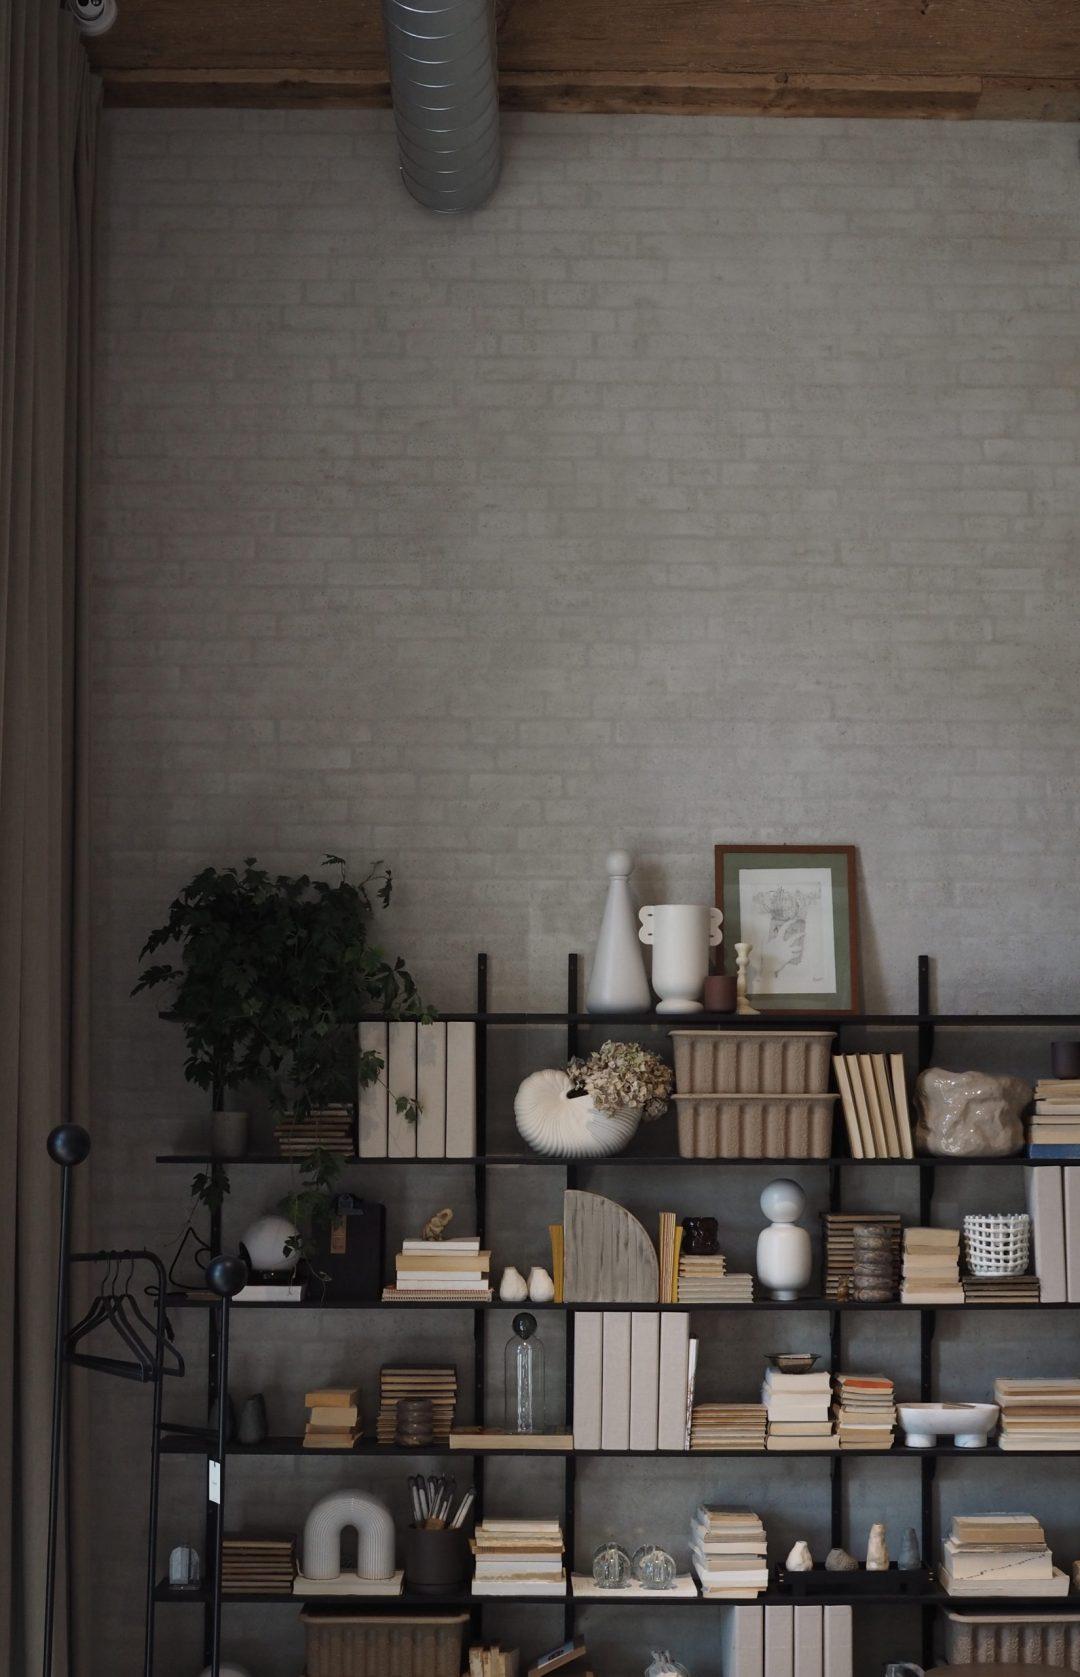 Ferm living shelf styling.